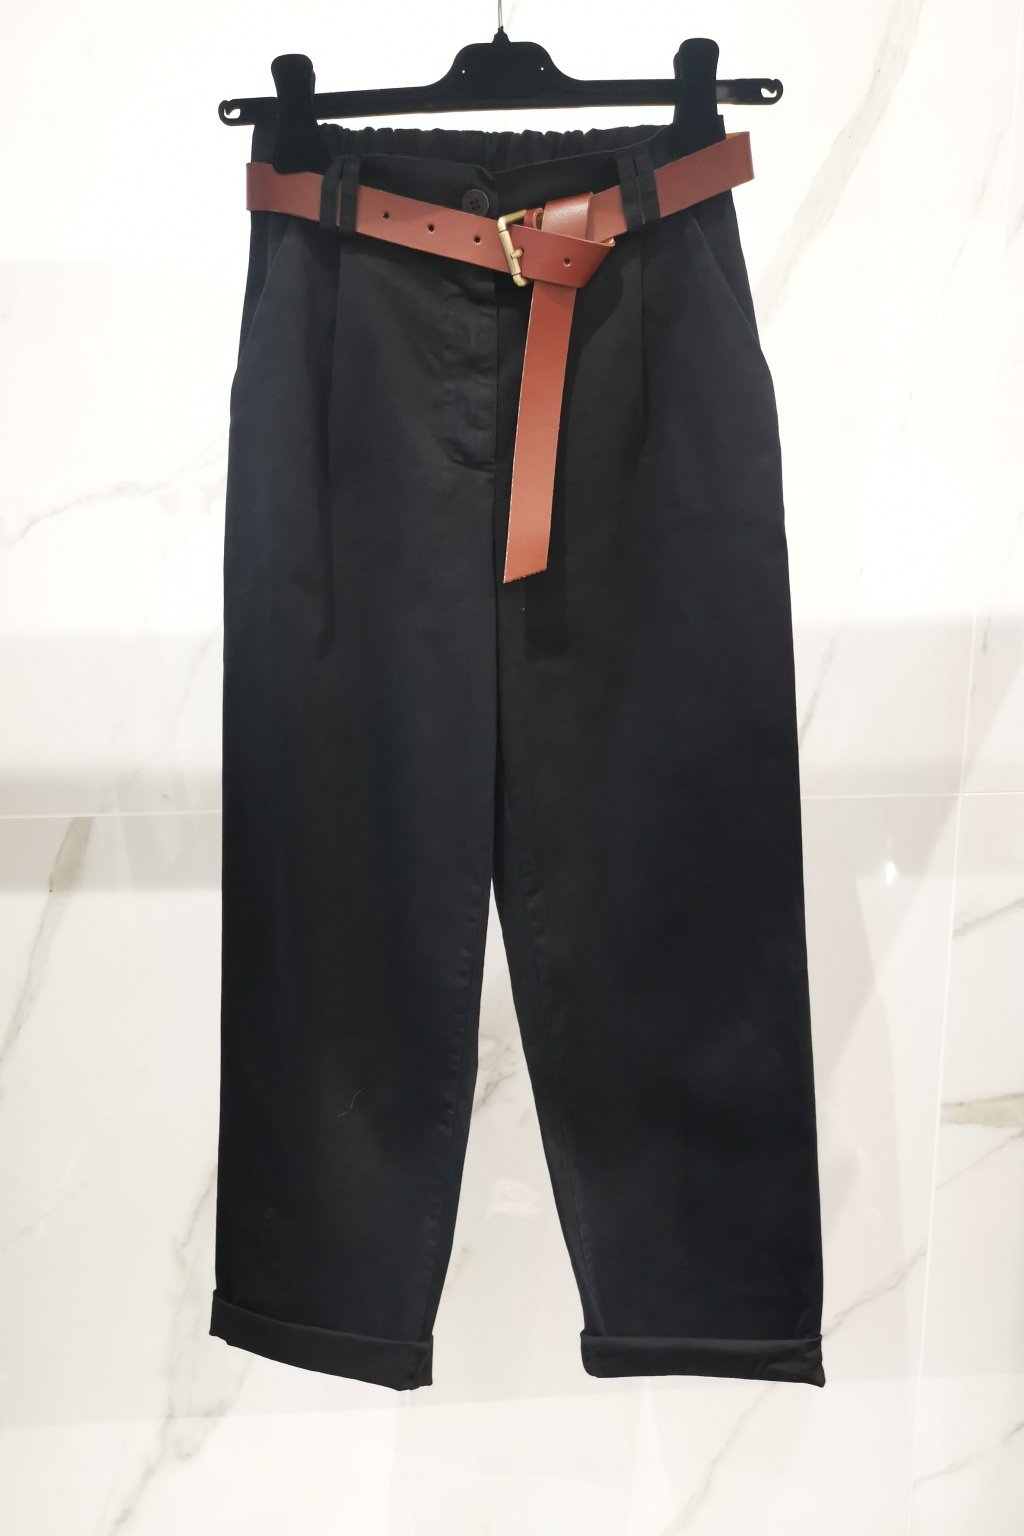 Nohavice s opaskom čierne